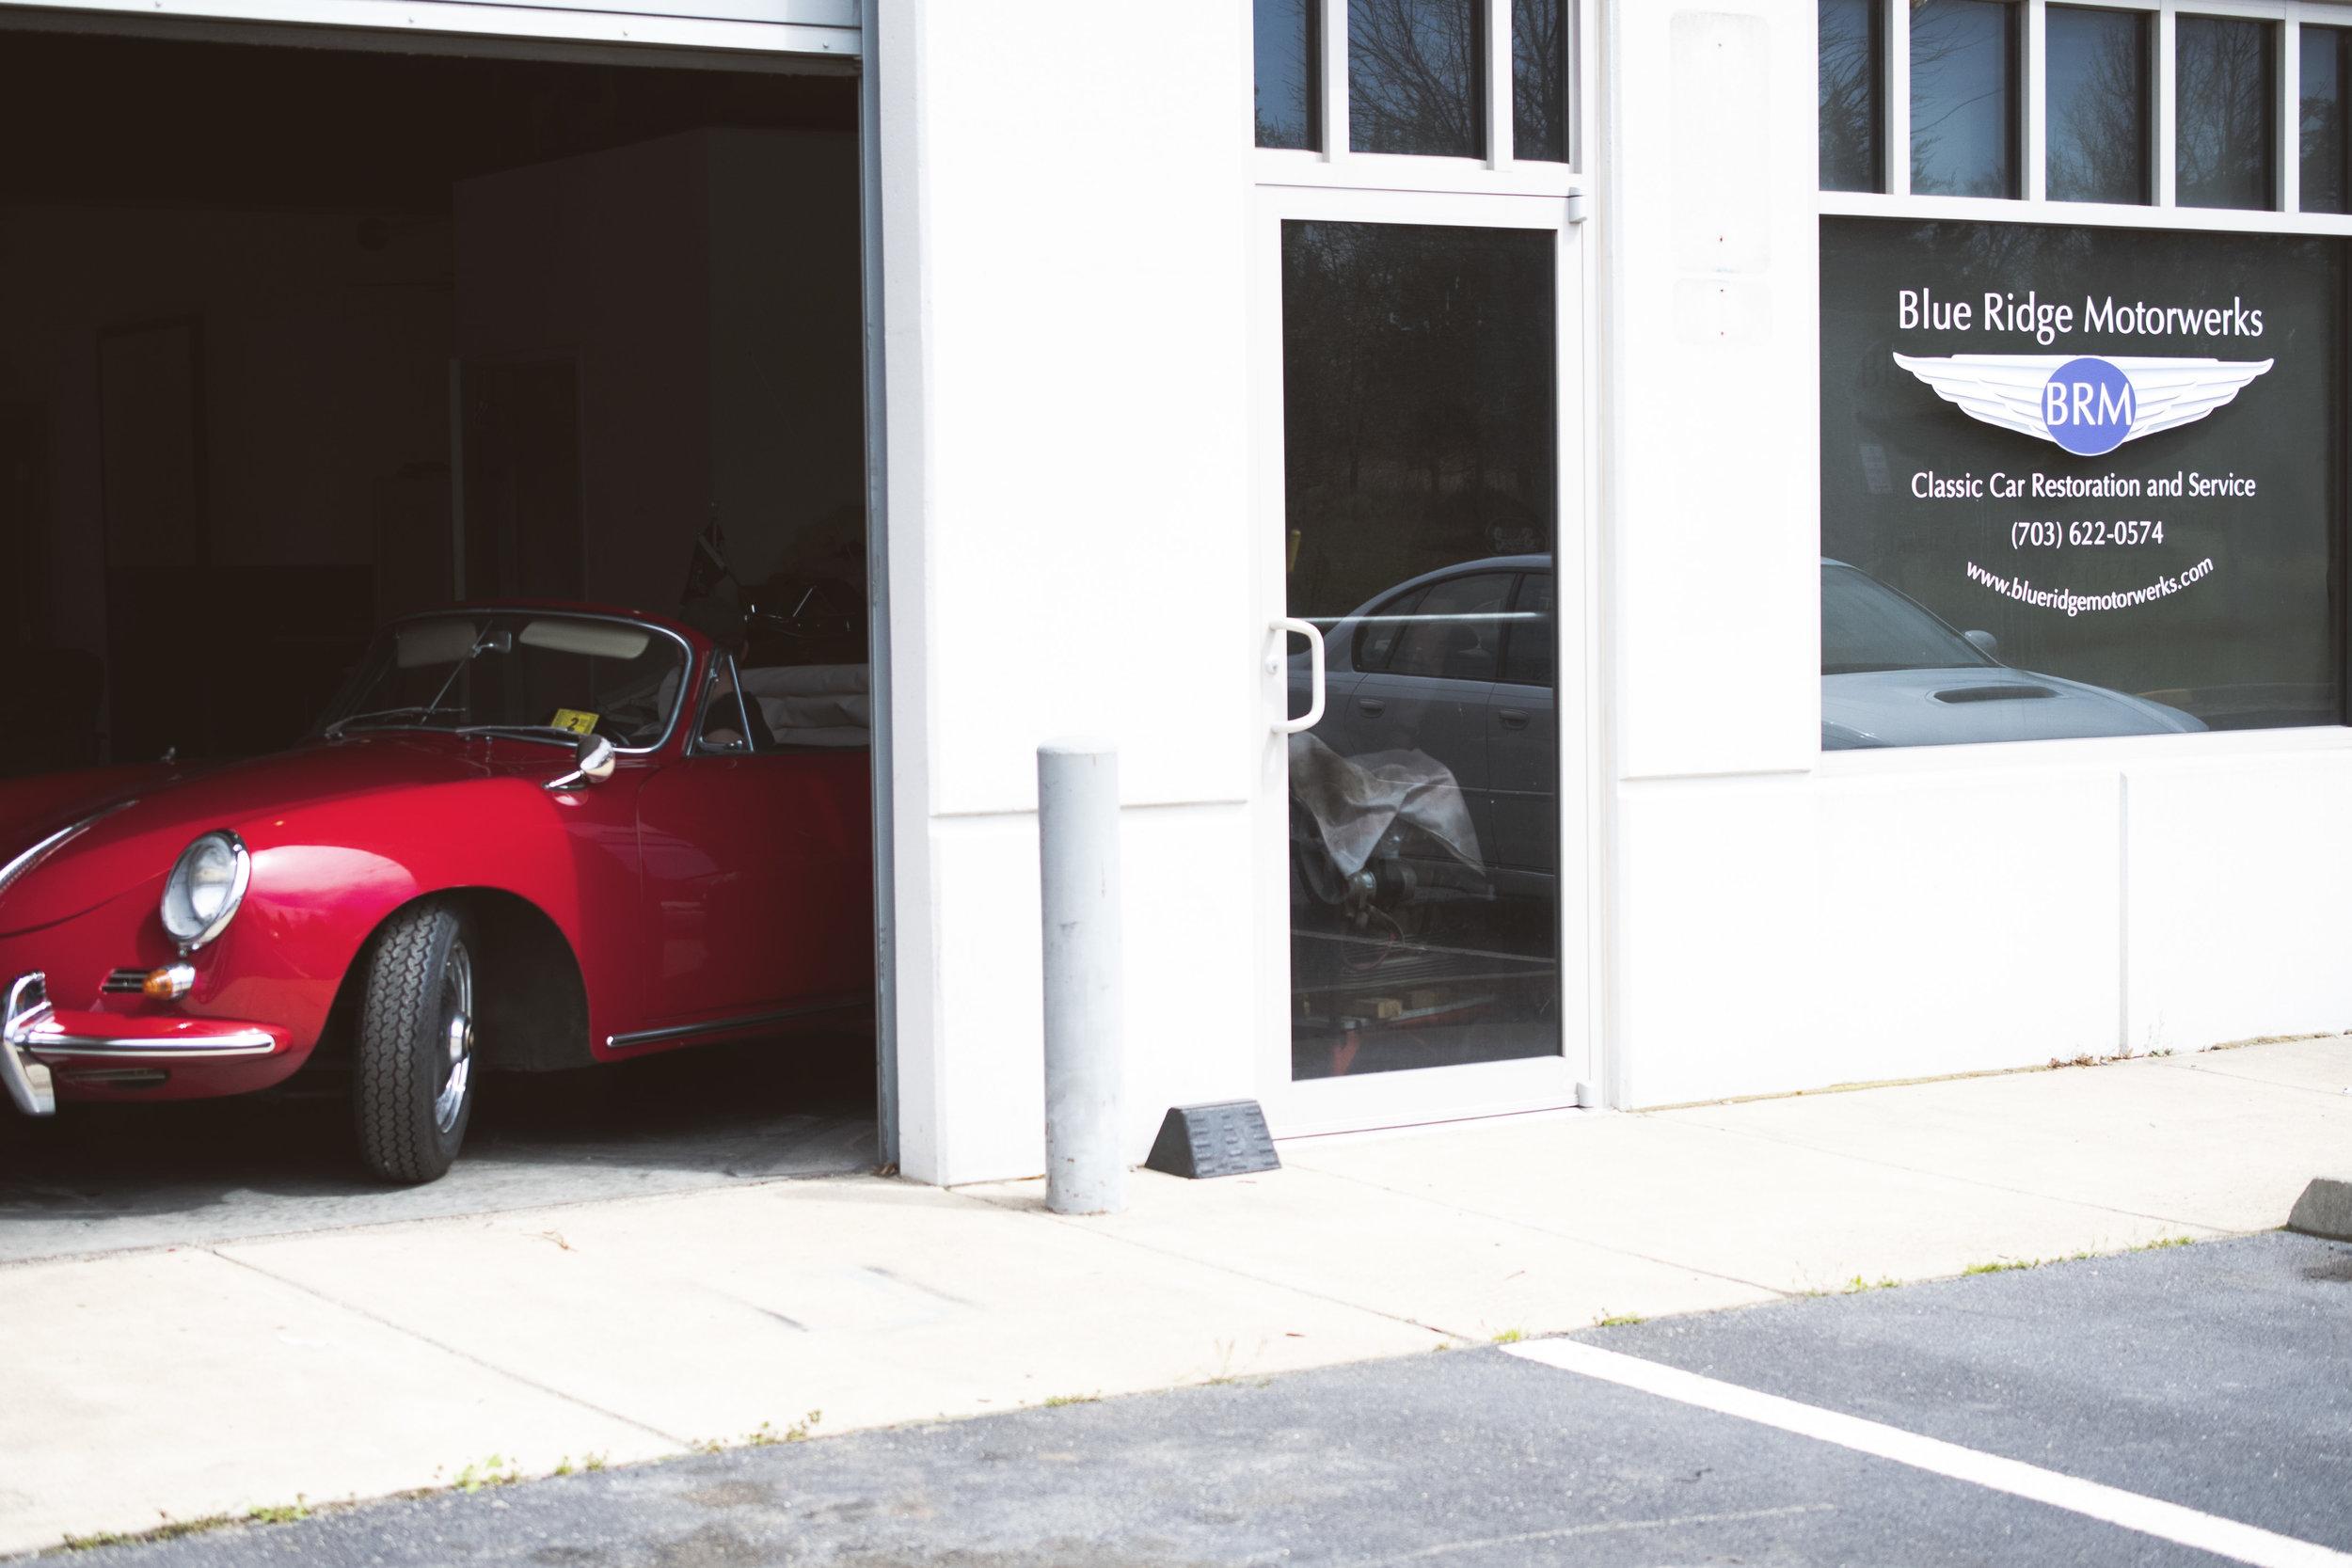 Blue Ridge Motorwerks store front.jpg